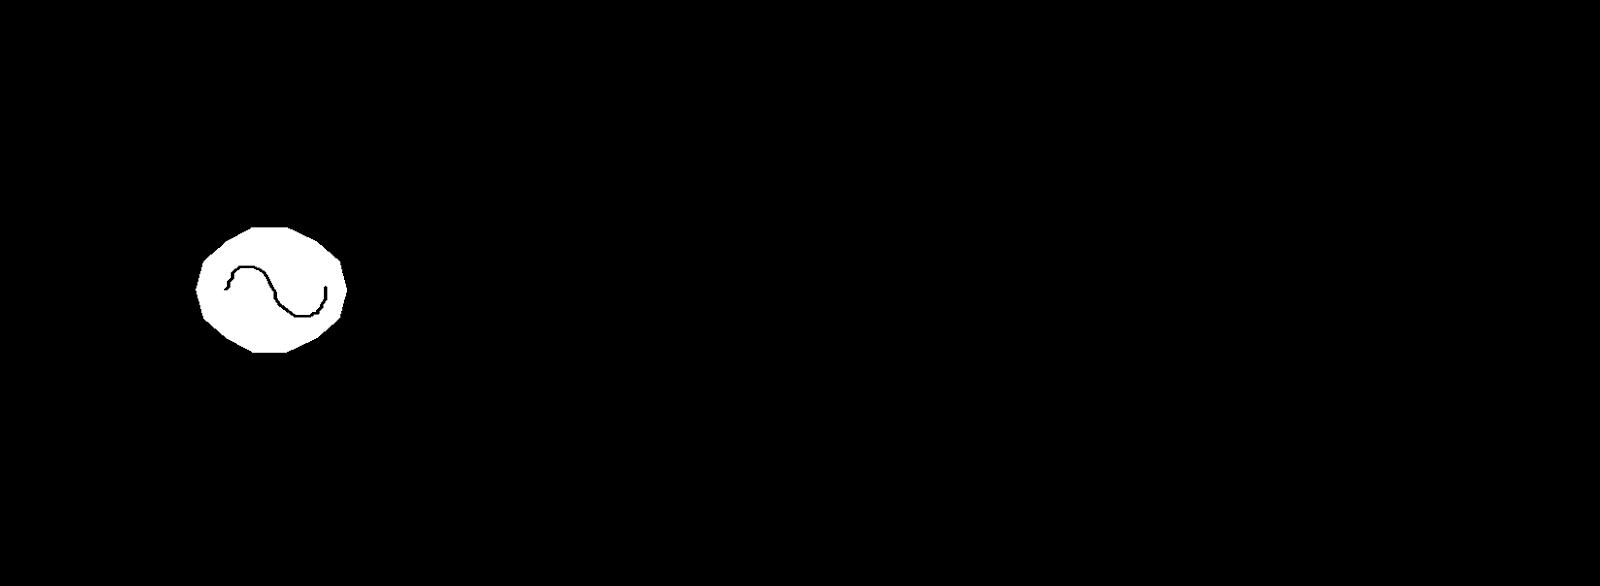 Makalah rangkaian rlc makalah b impedansi r l paralel ccuart Images